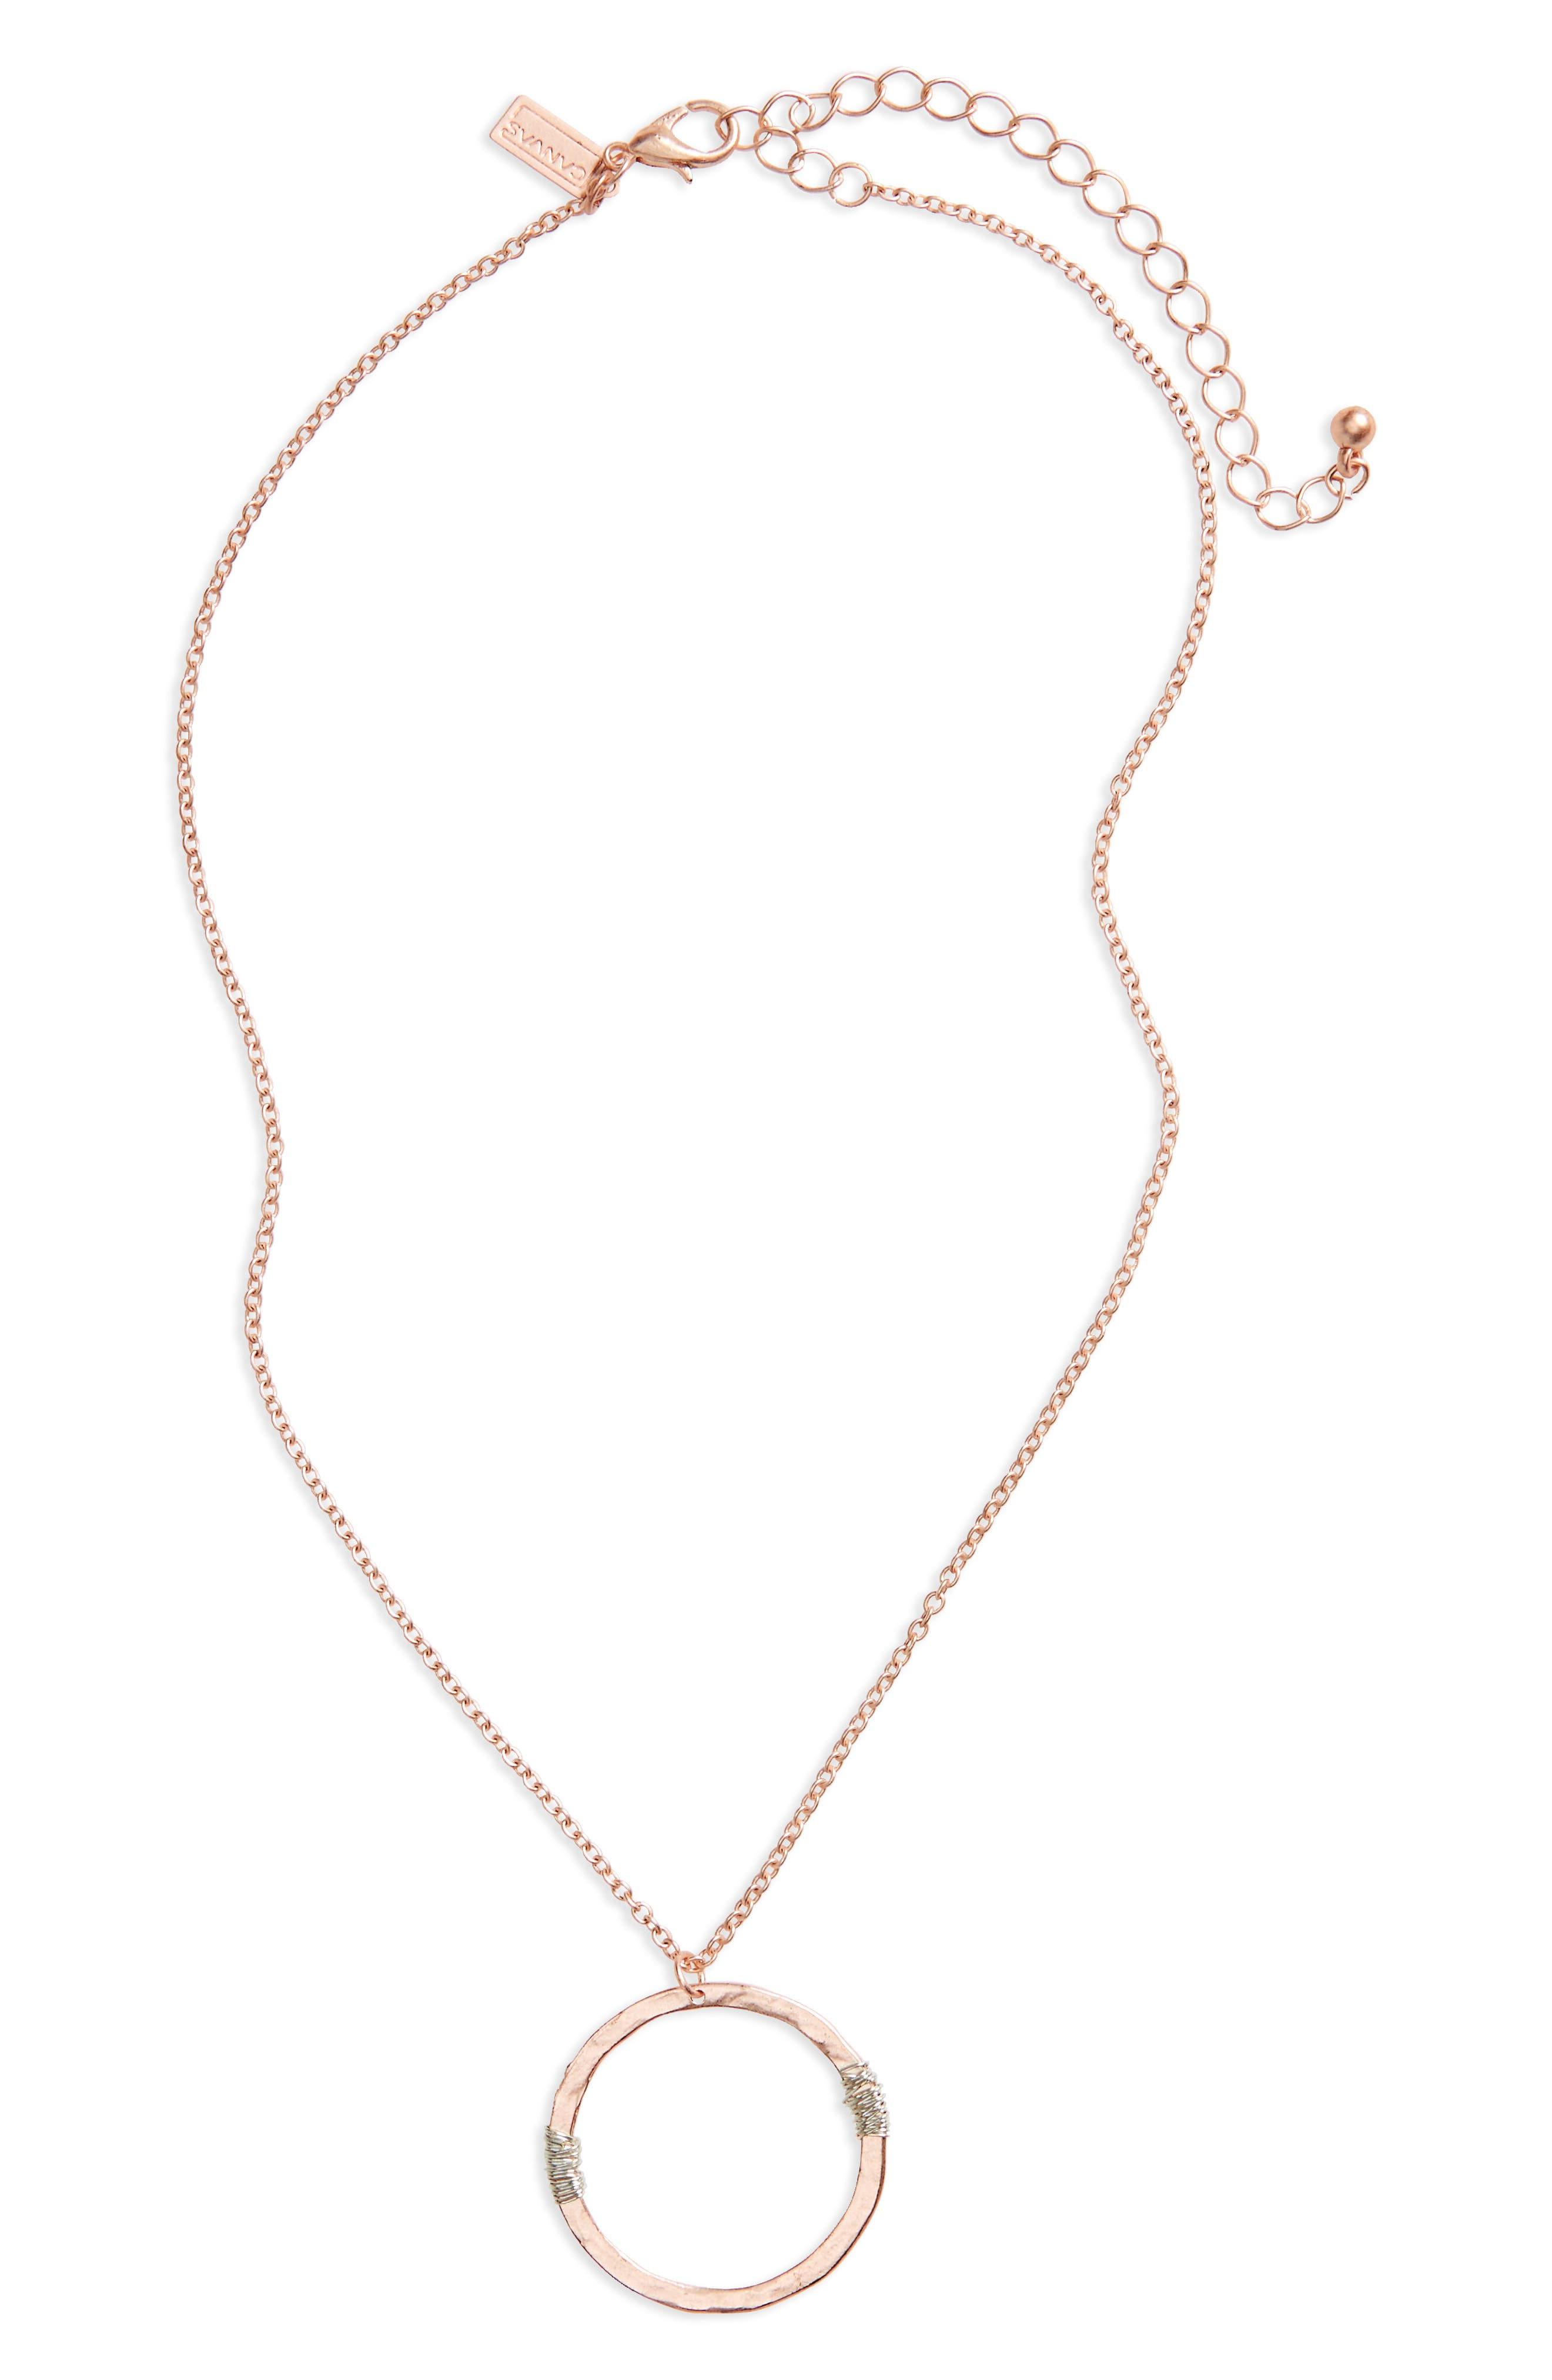 Wire Wrap Open Circle Pendant Necklace,                             Main thumbnail 1, color,                             710